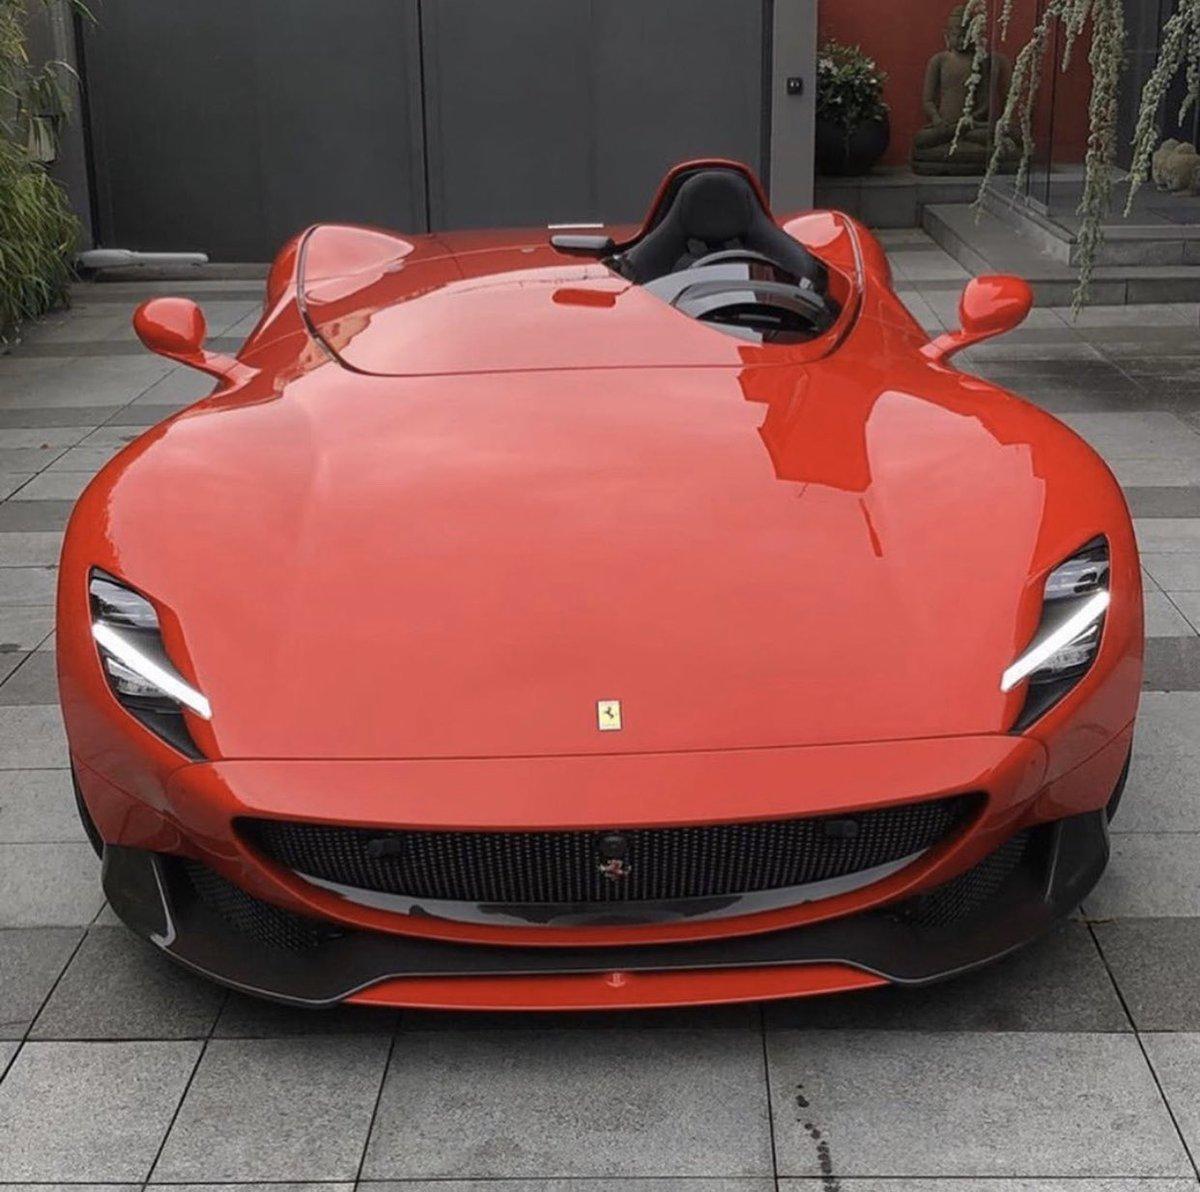 Michael Louis On Twitter The Perfect Quarantine Companion The One Seater Ferrari Monza Sp1 Michaellouis